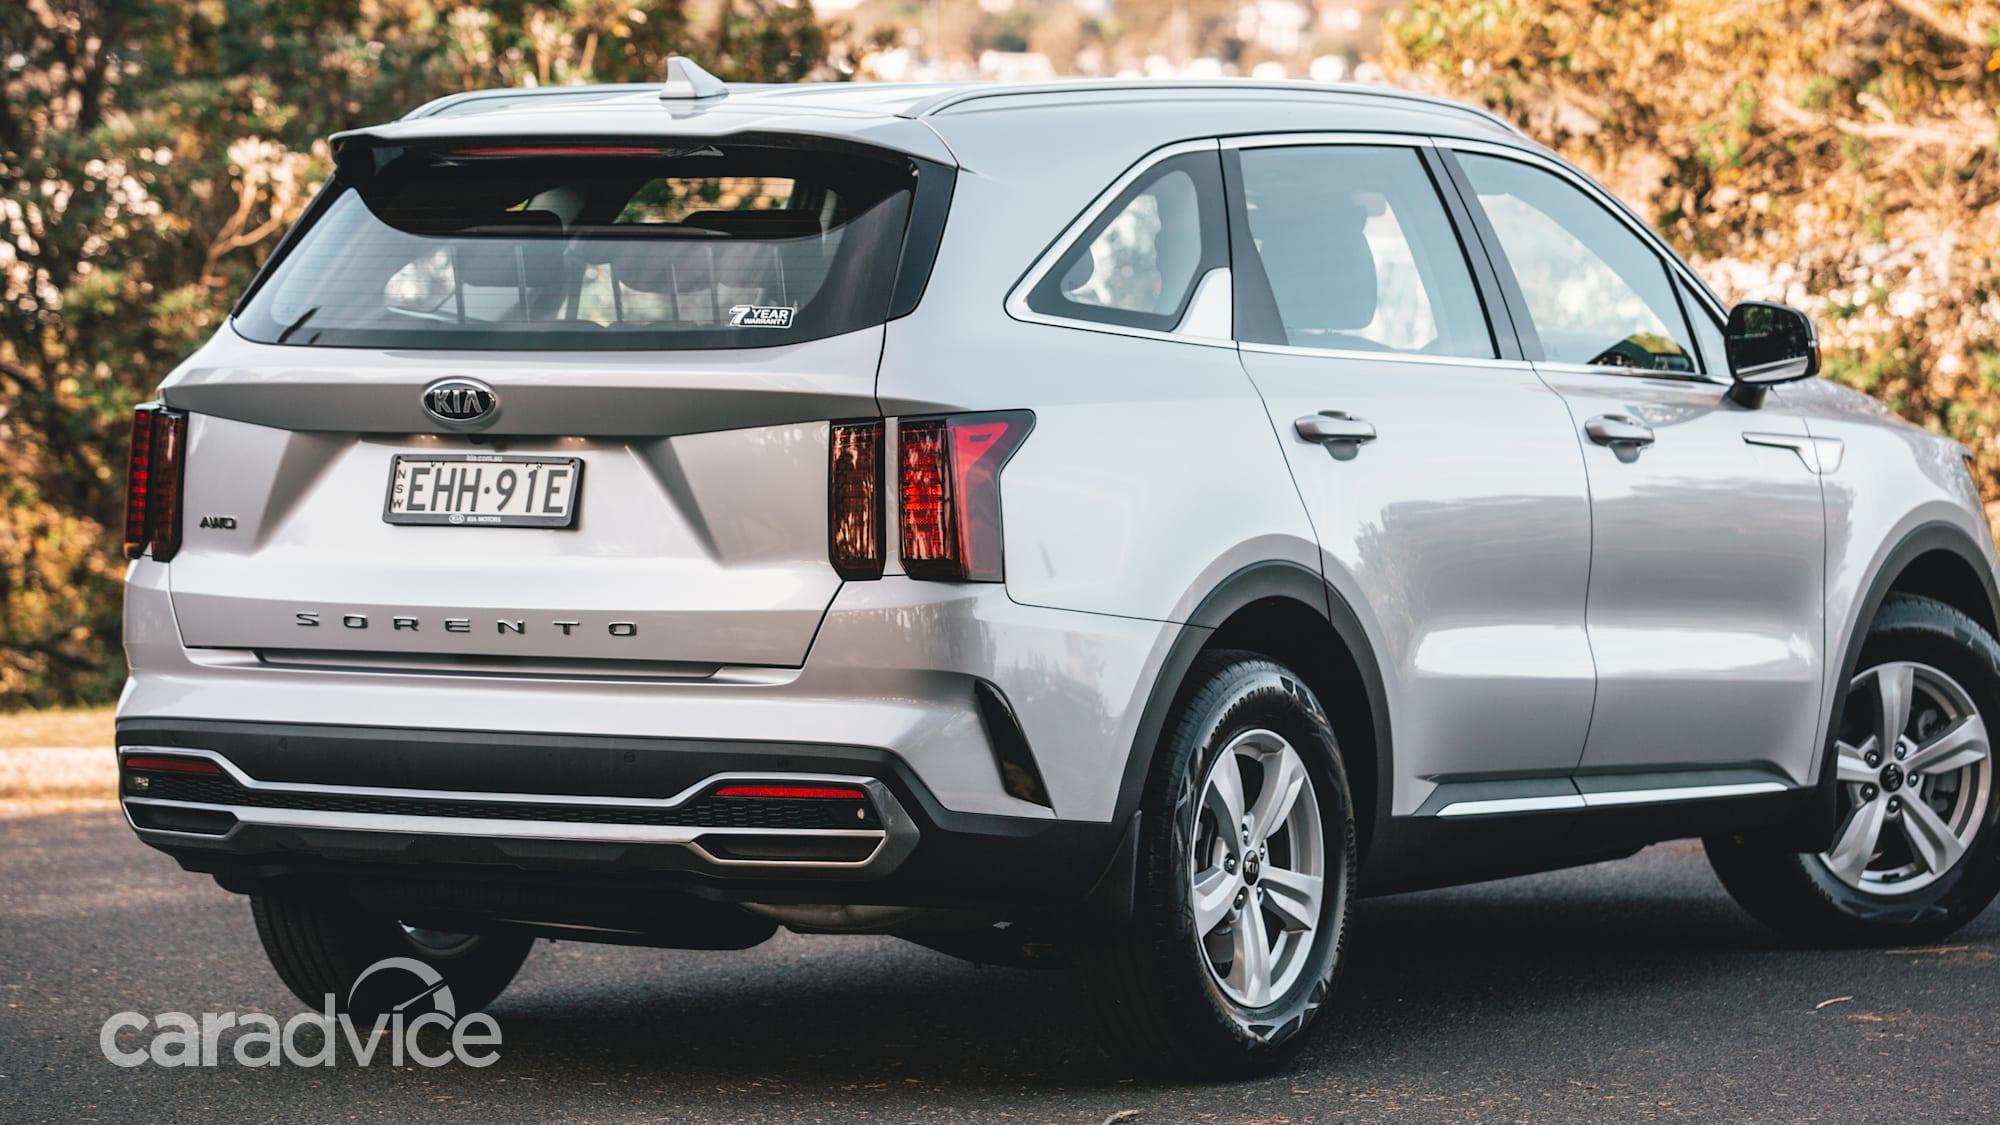 2021 Kia Sorento S diesel review | CarAdvice